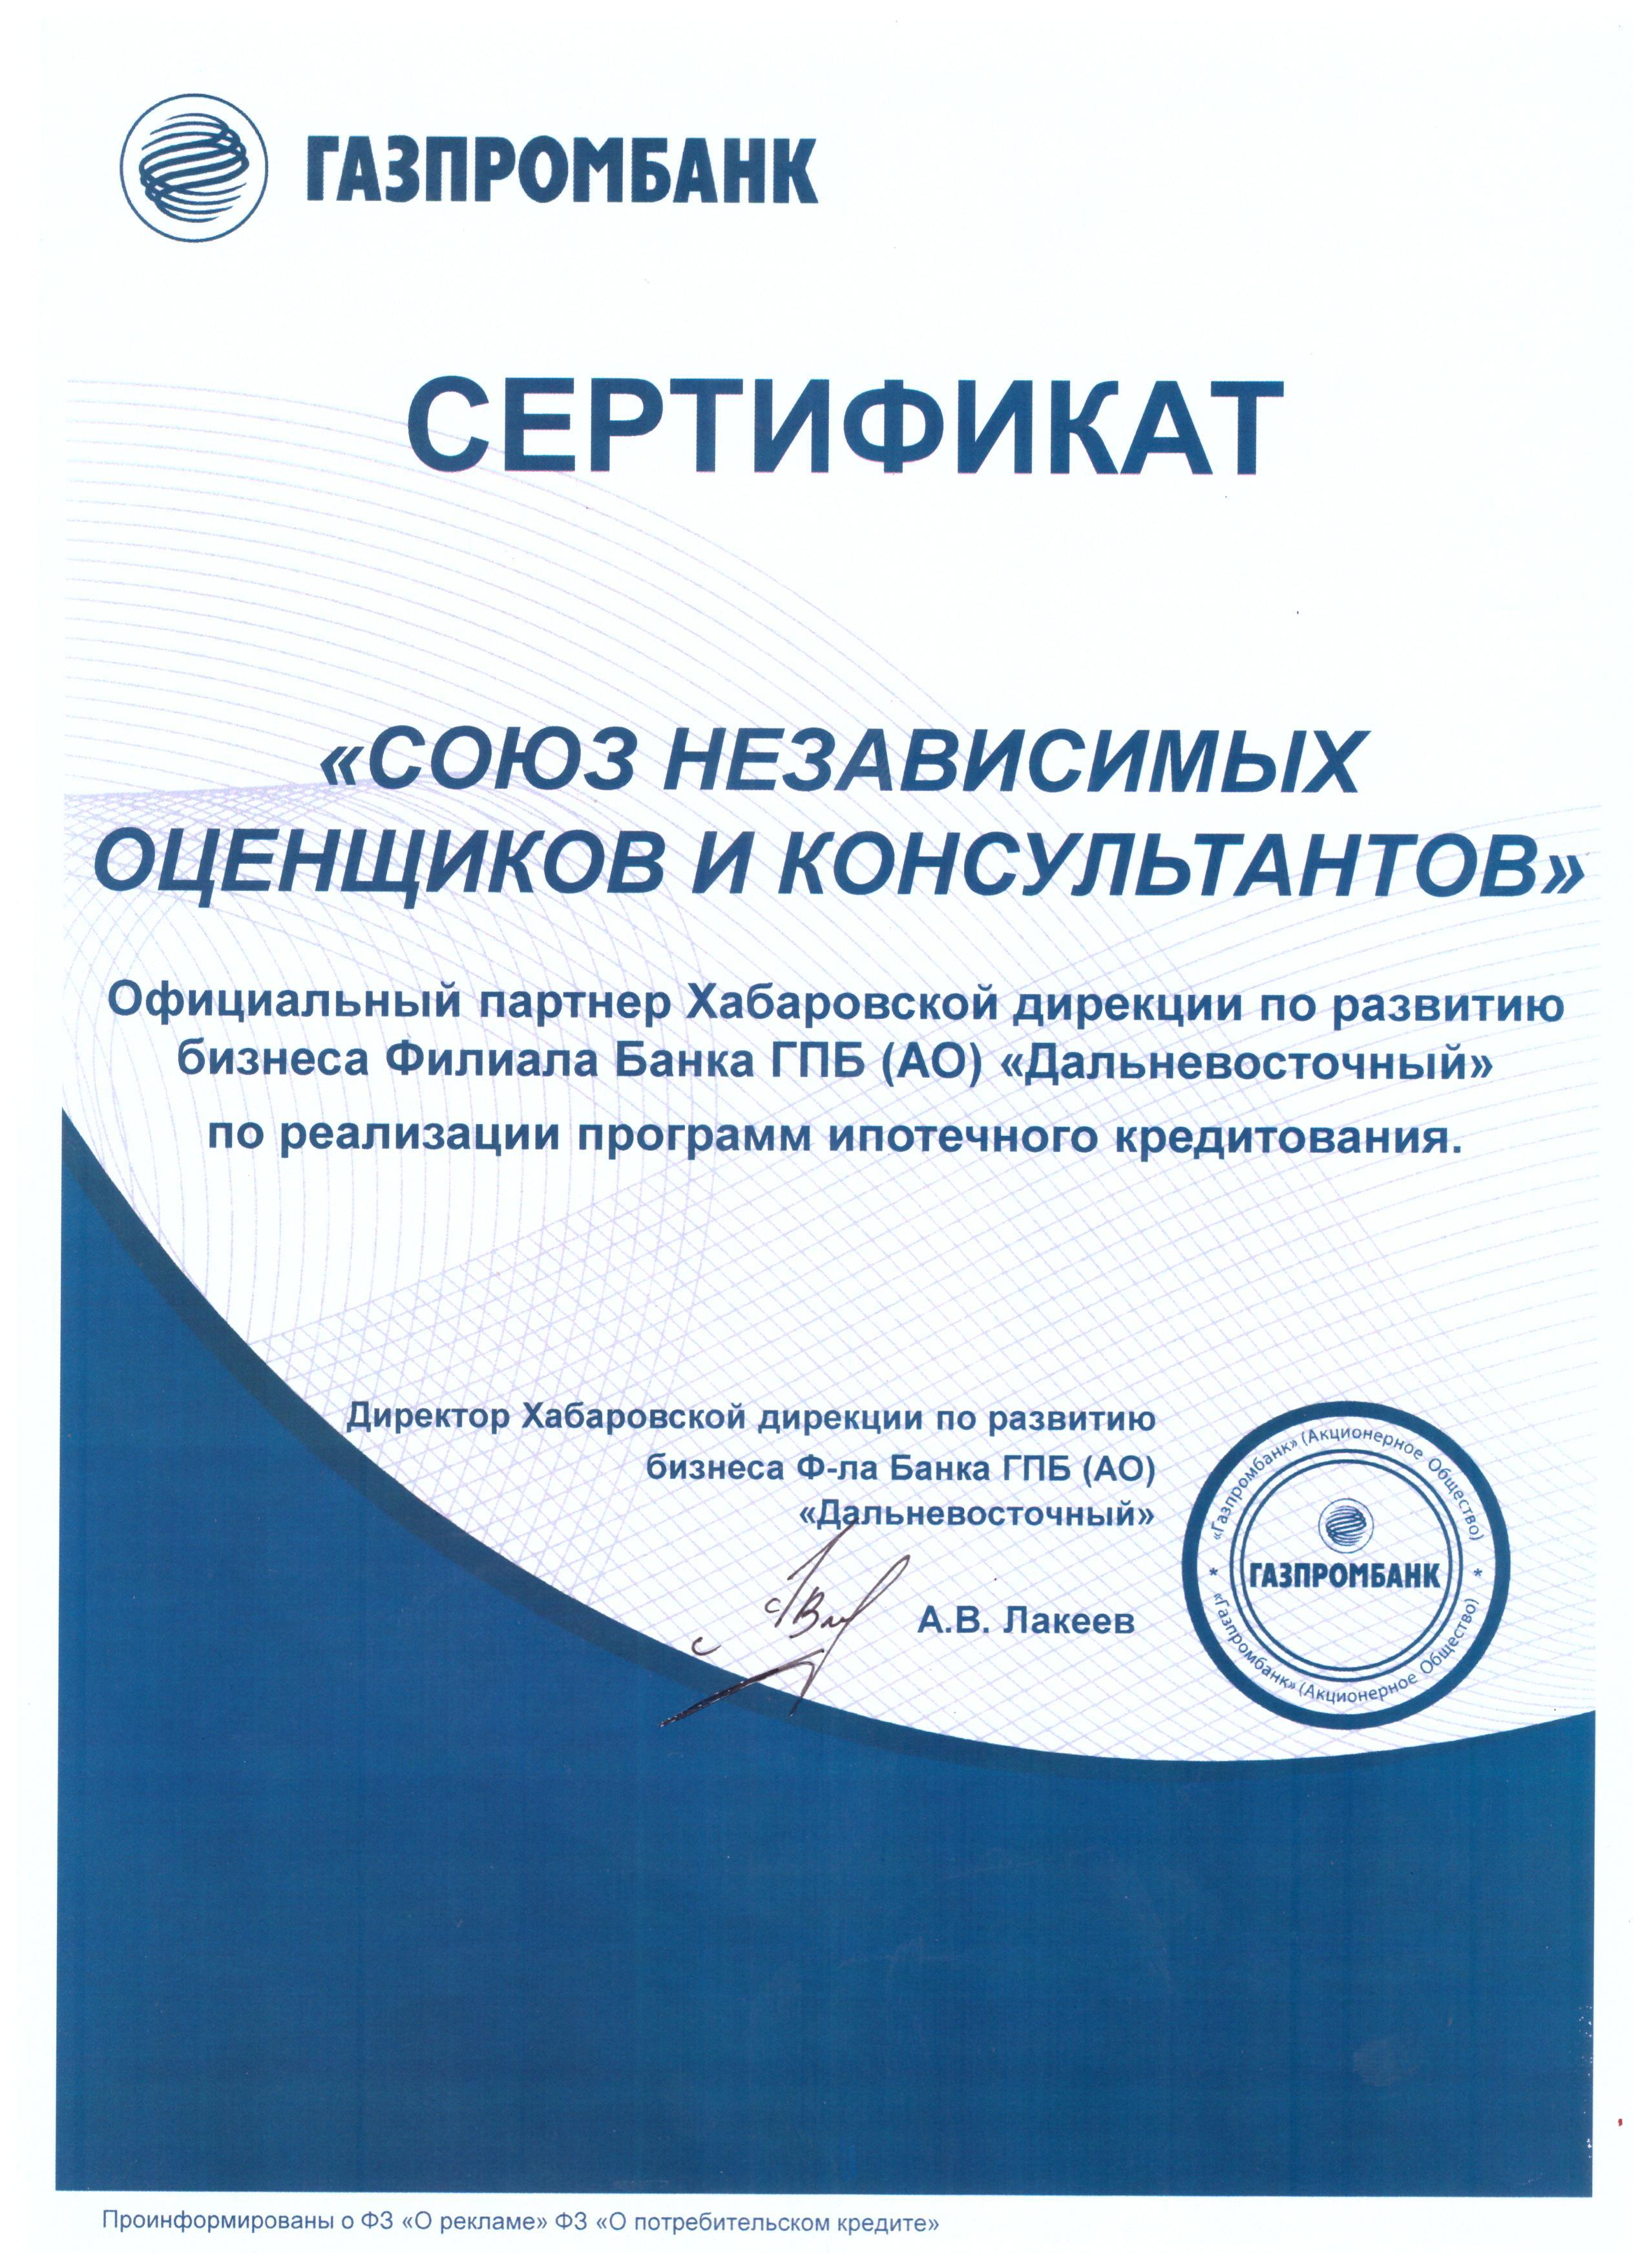 5b437168b6156.jpg